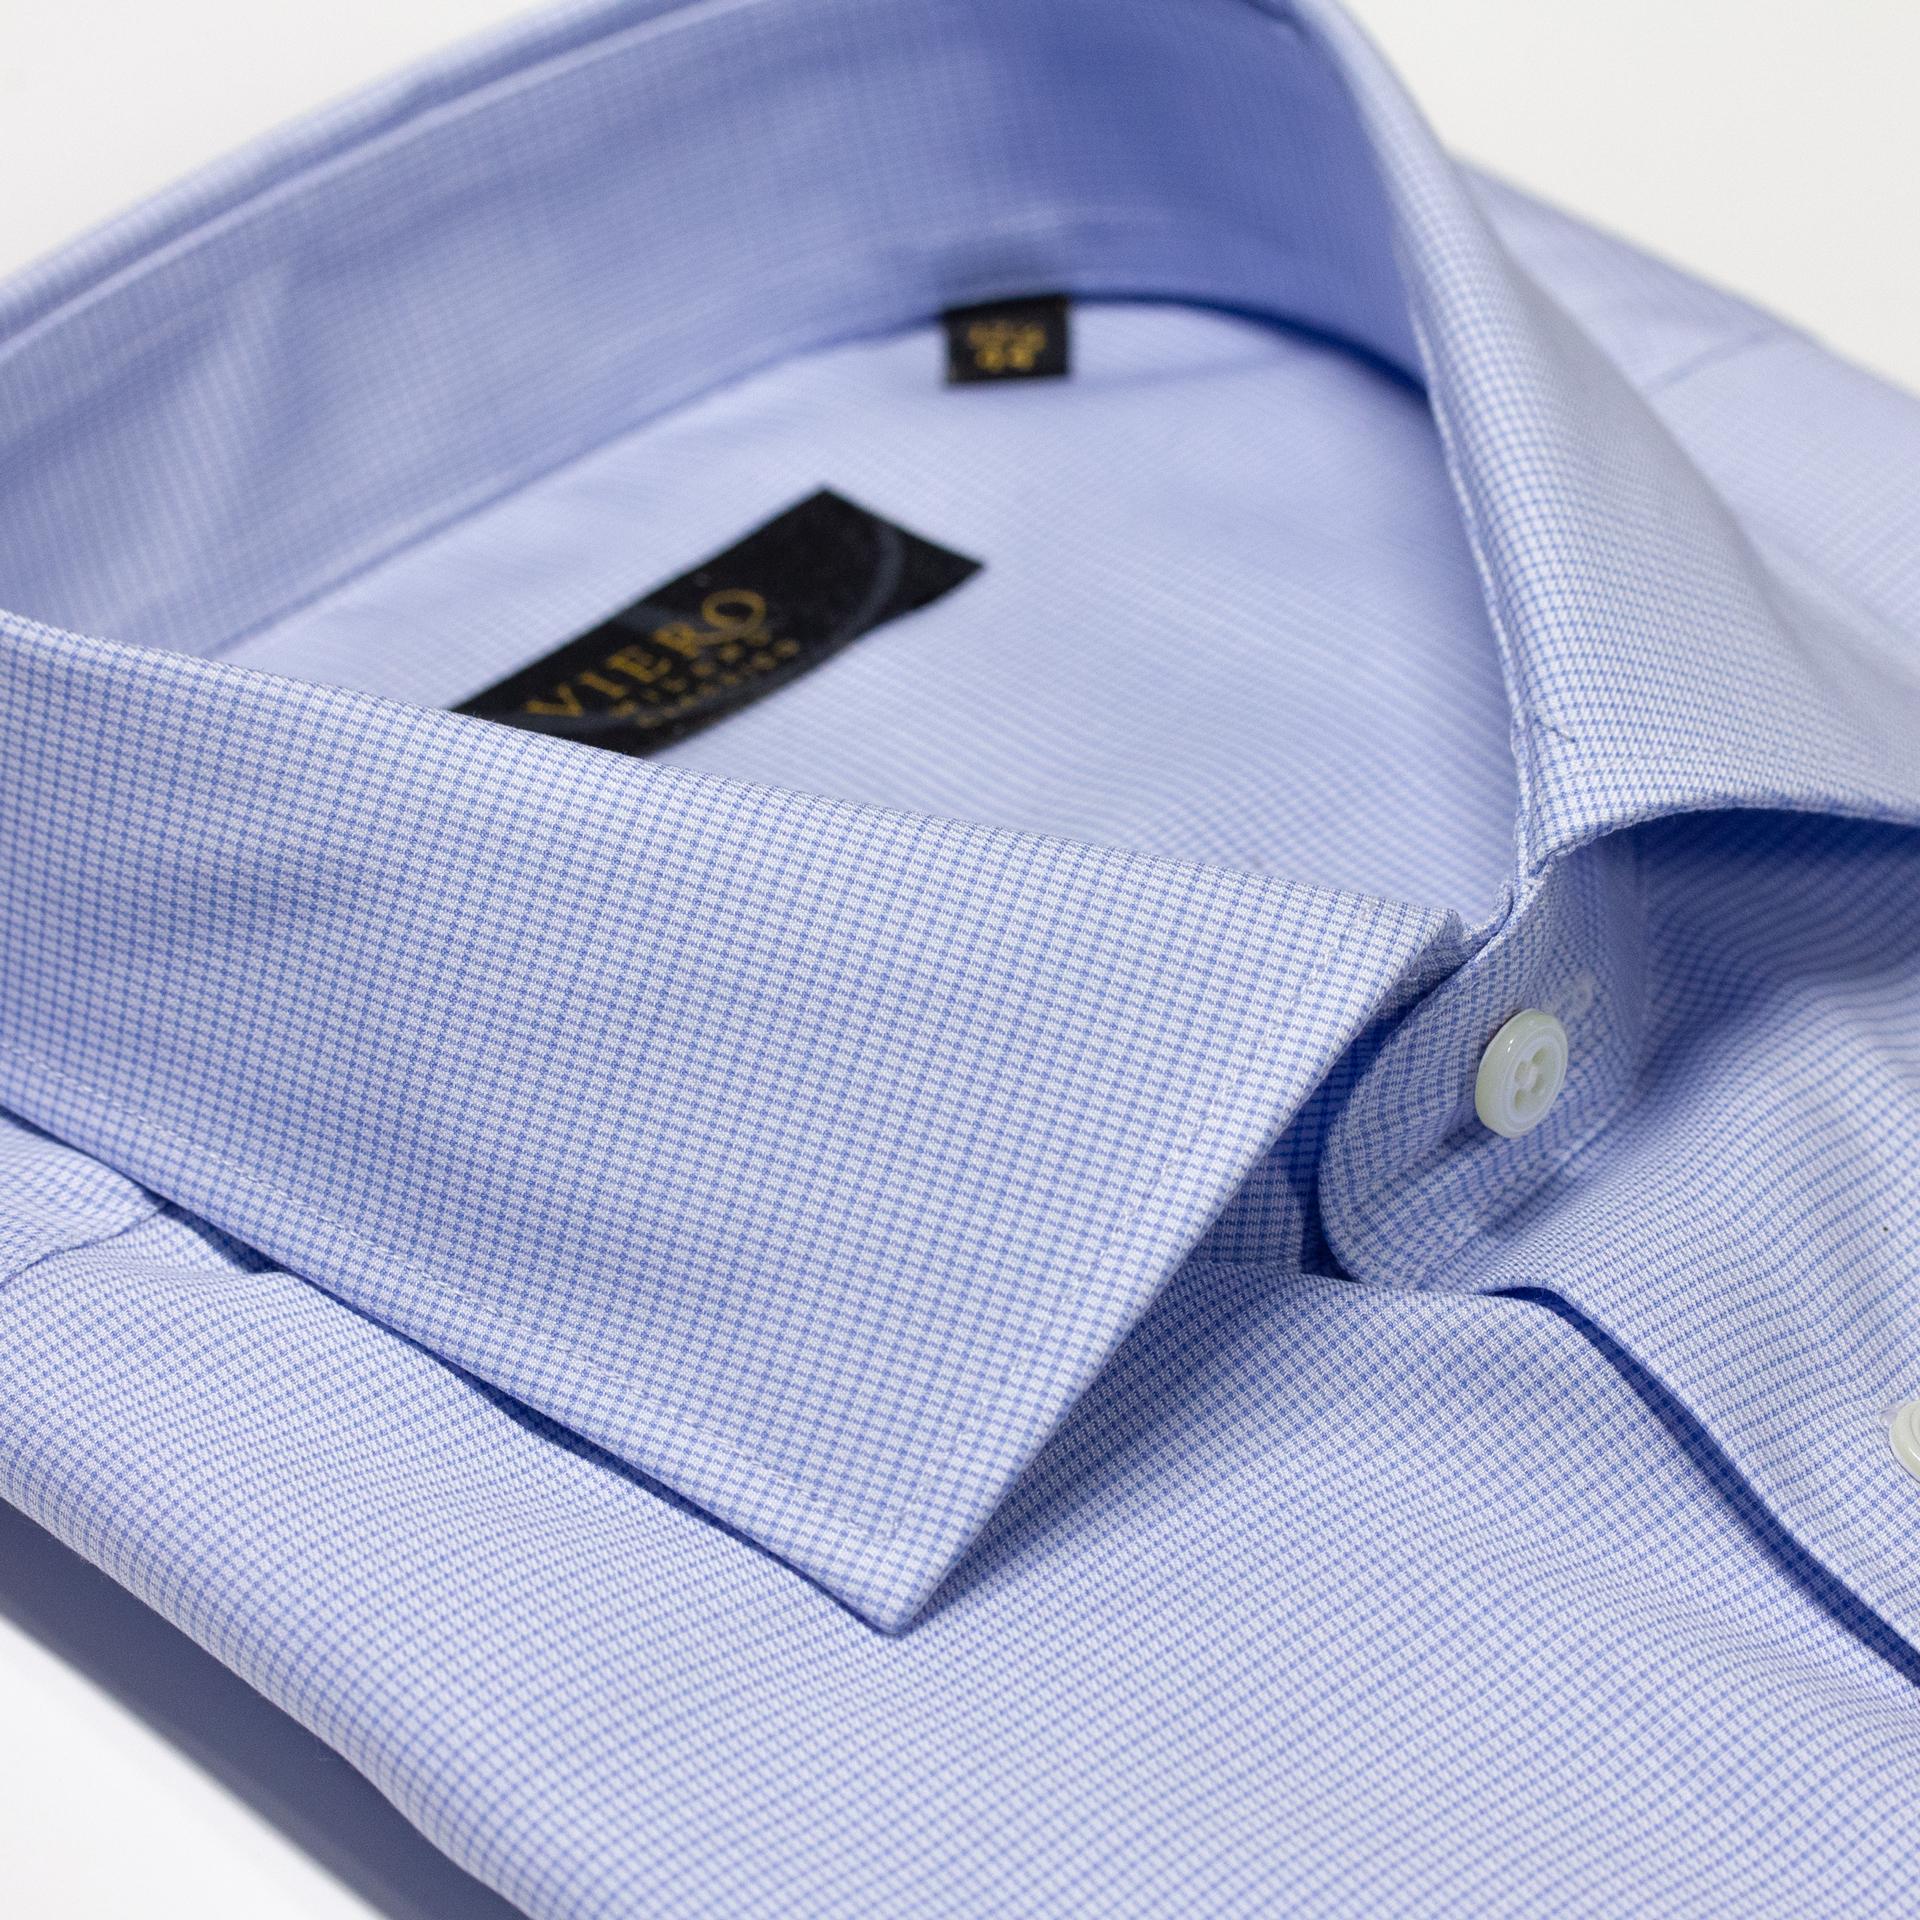 Skjorte, mørkeblå pin, Slimfit fra Viero Milano. Menswear.no